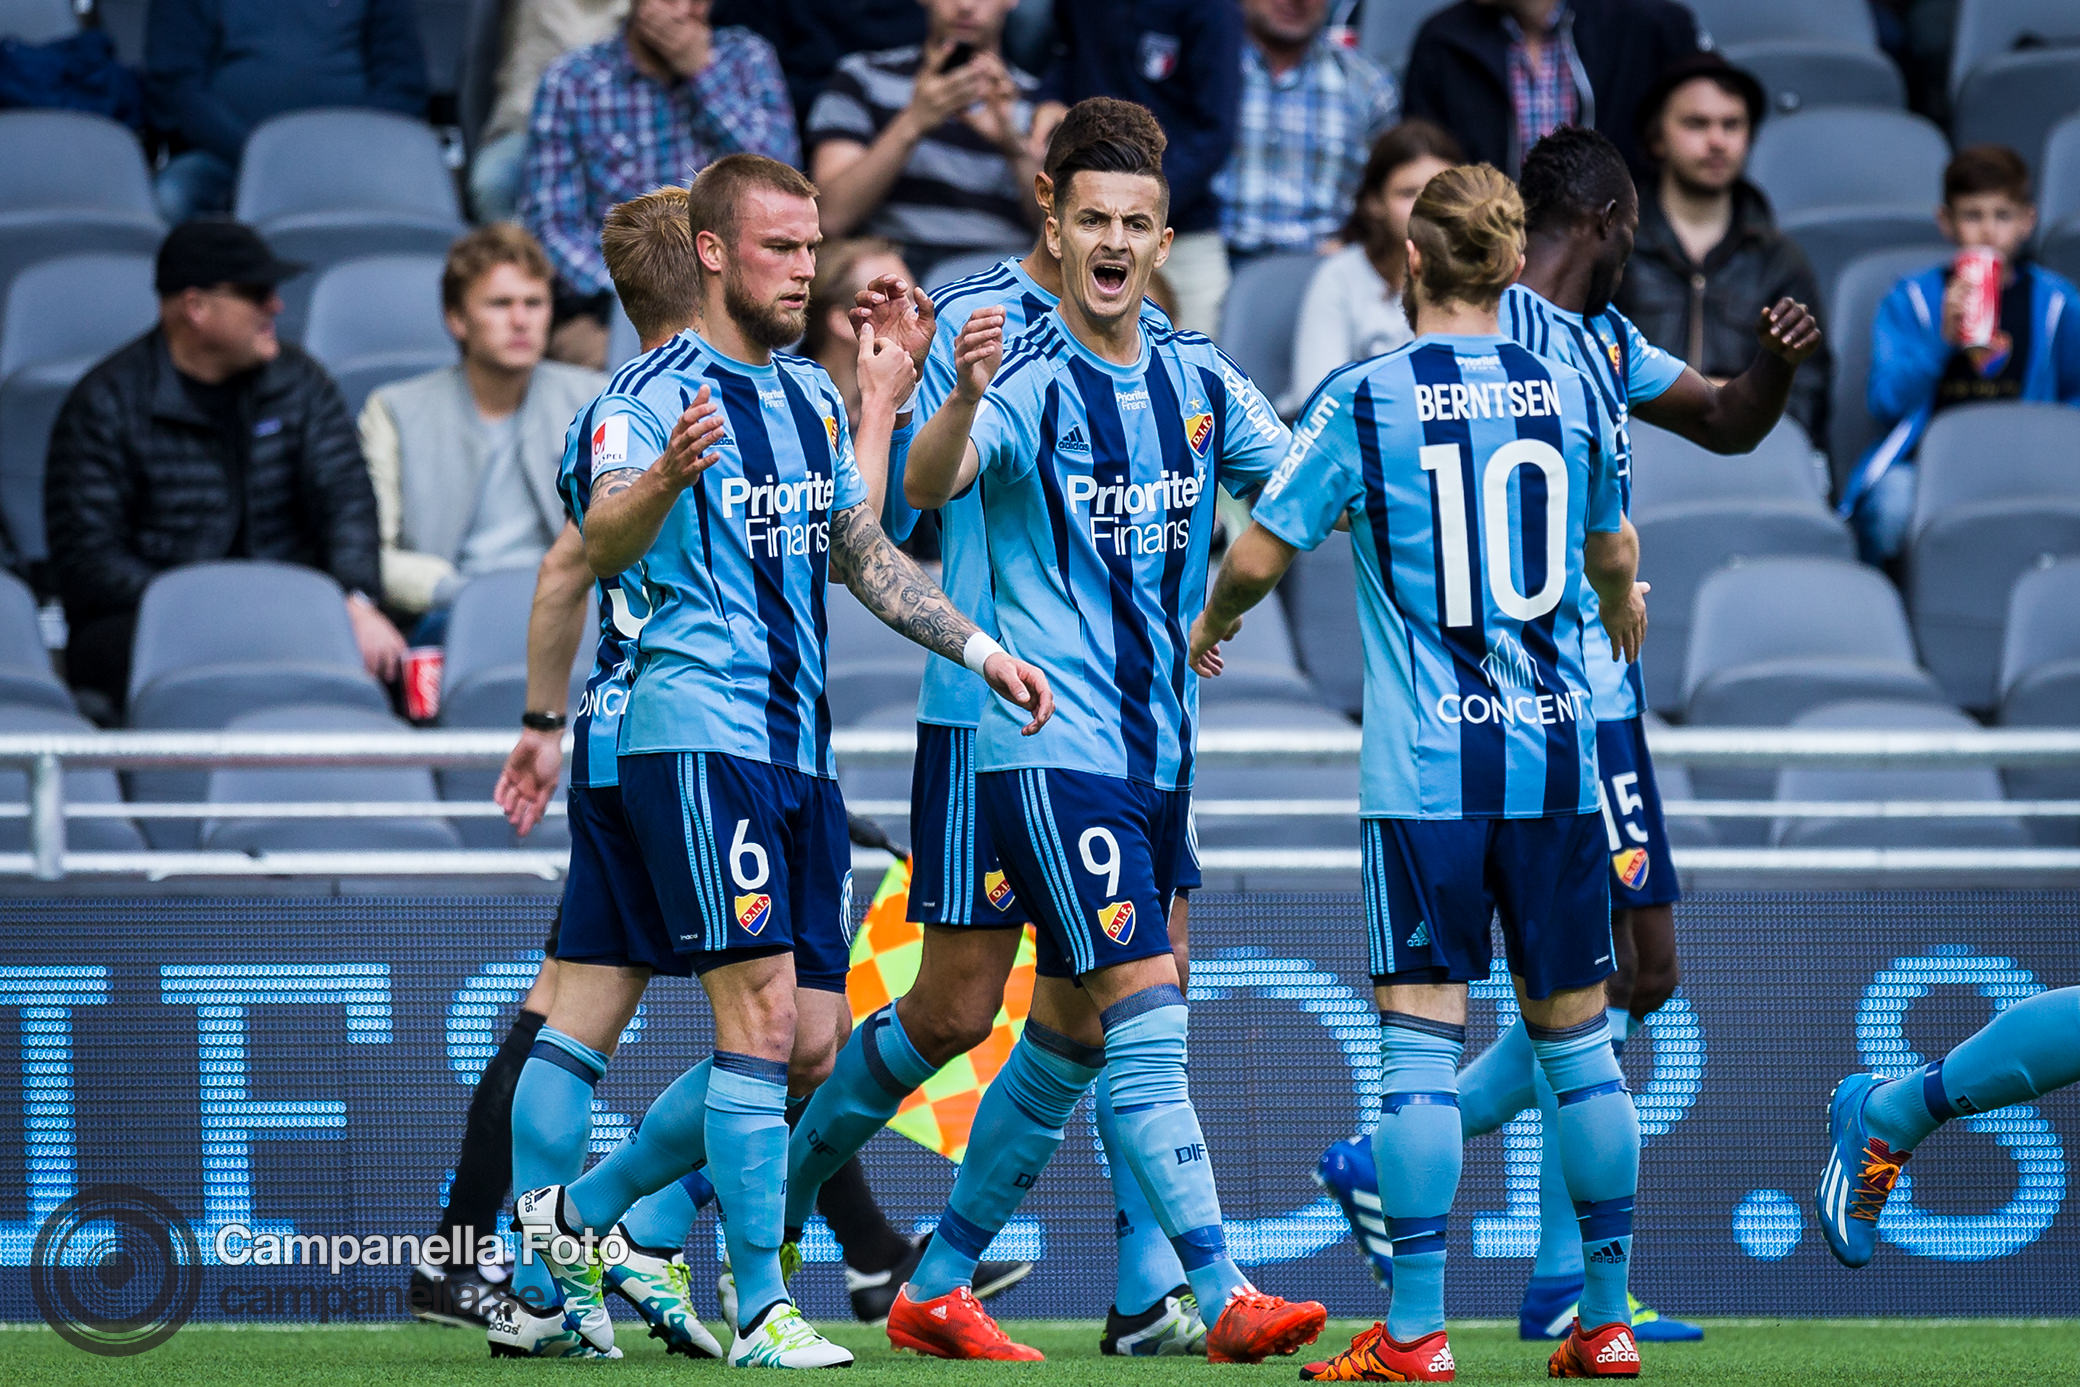 Djurgården gets back to winning - Michael Campanella Photography